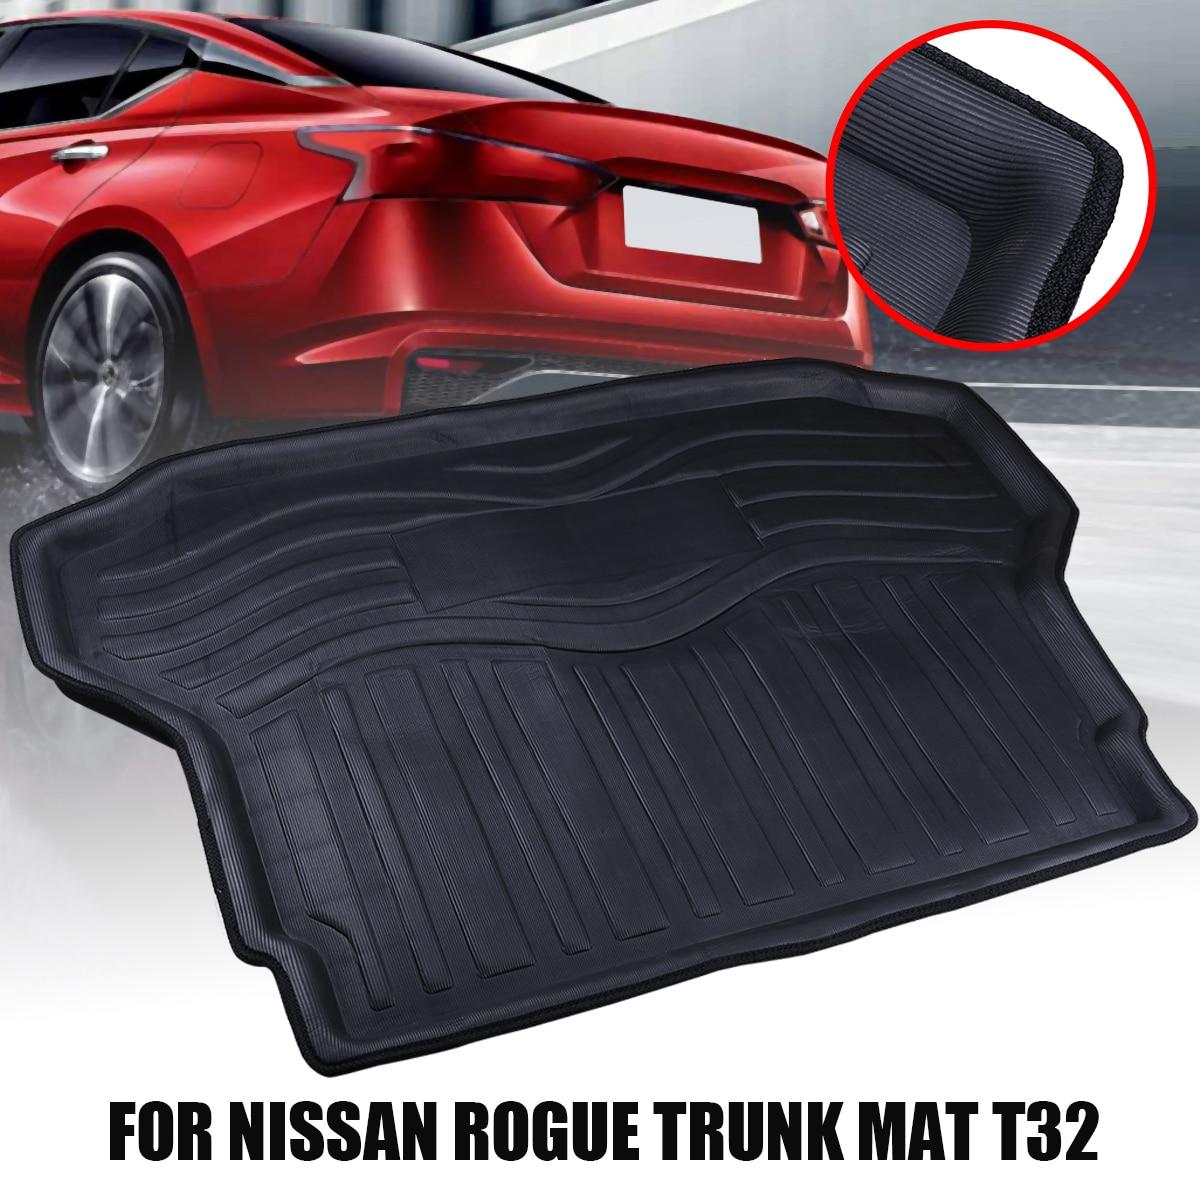 Car Interior Floor Mats 3D High side Rear Trunk Cargo Boot Mat Liner Tray For Nissan Rogue X Trail 2014 2018